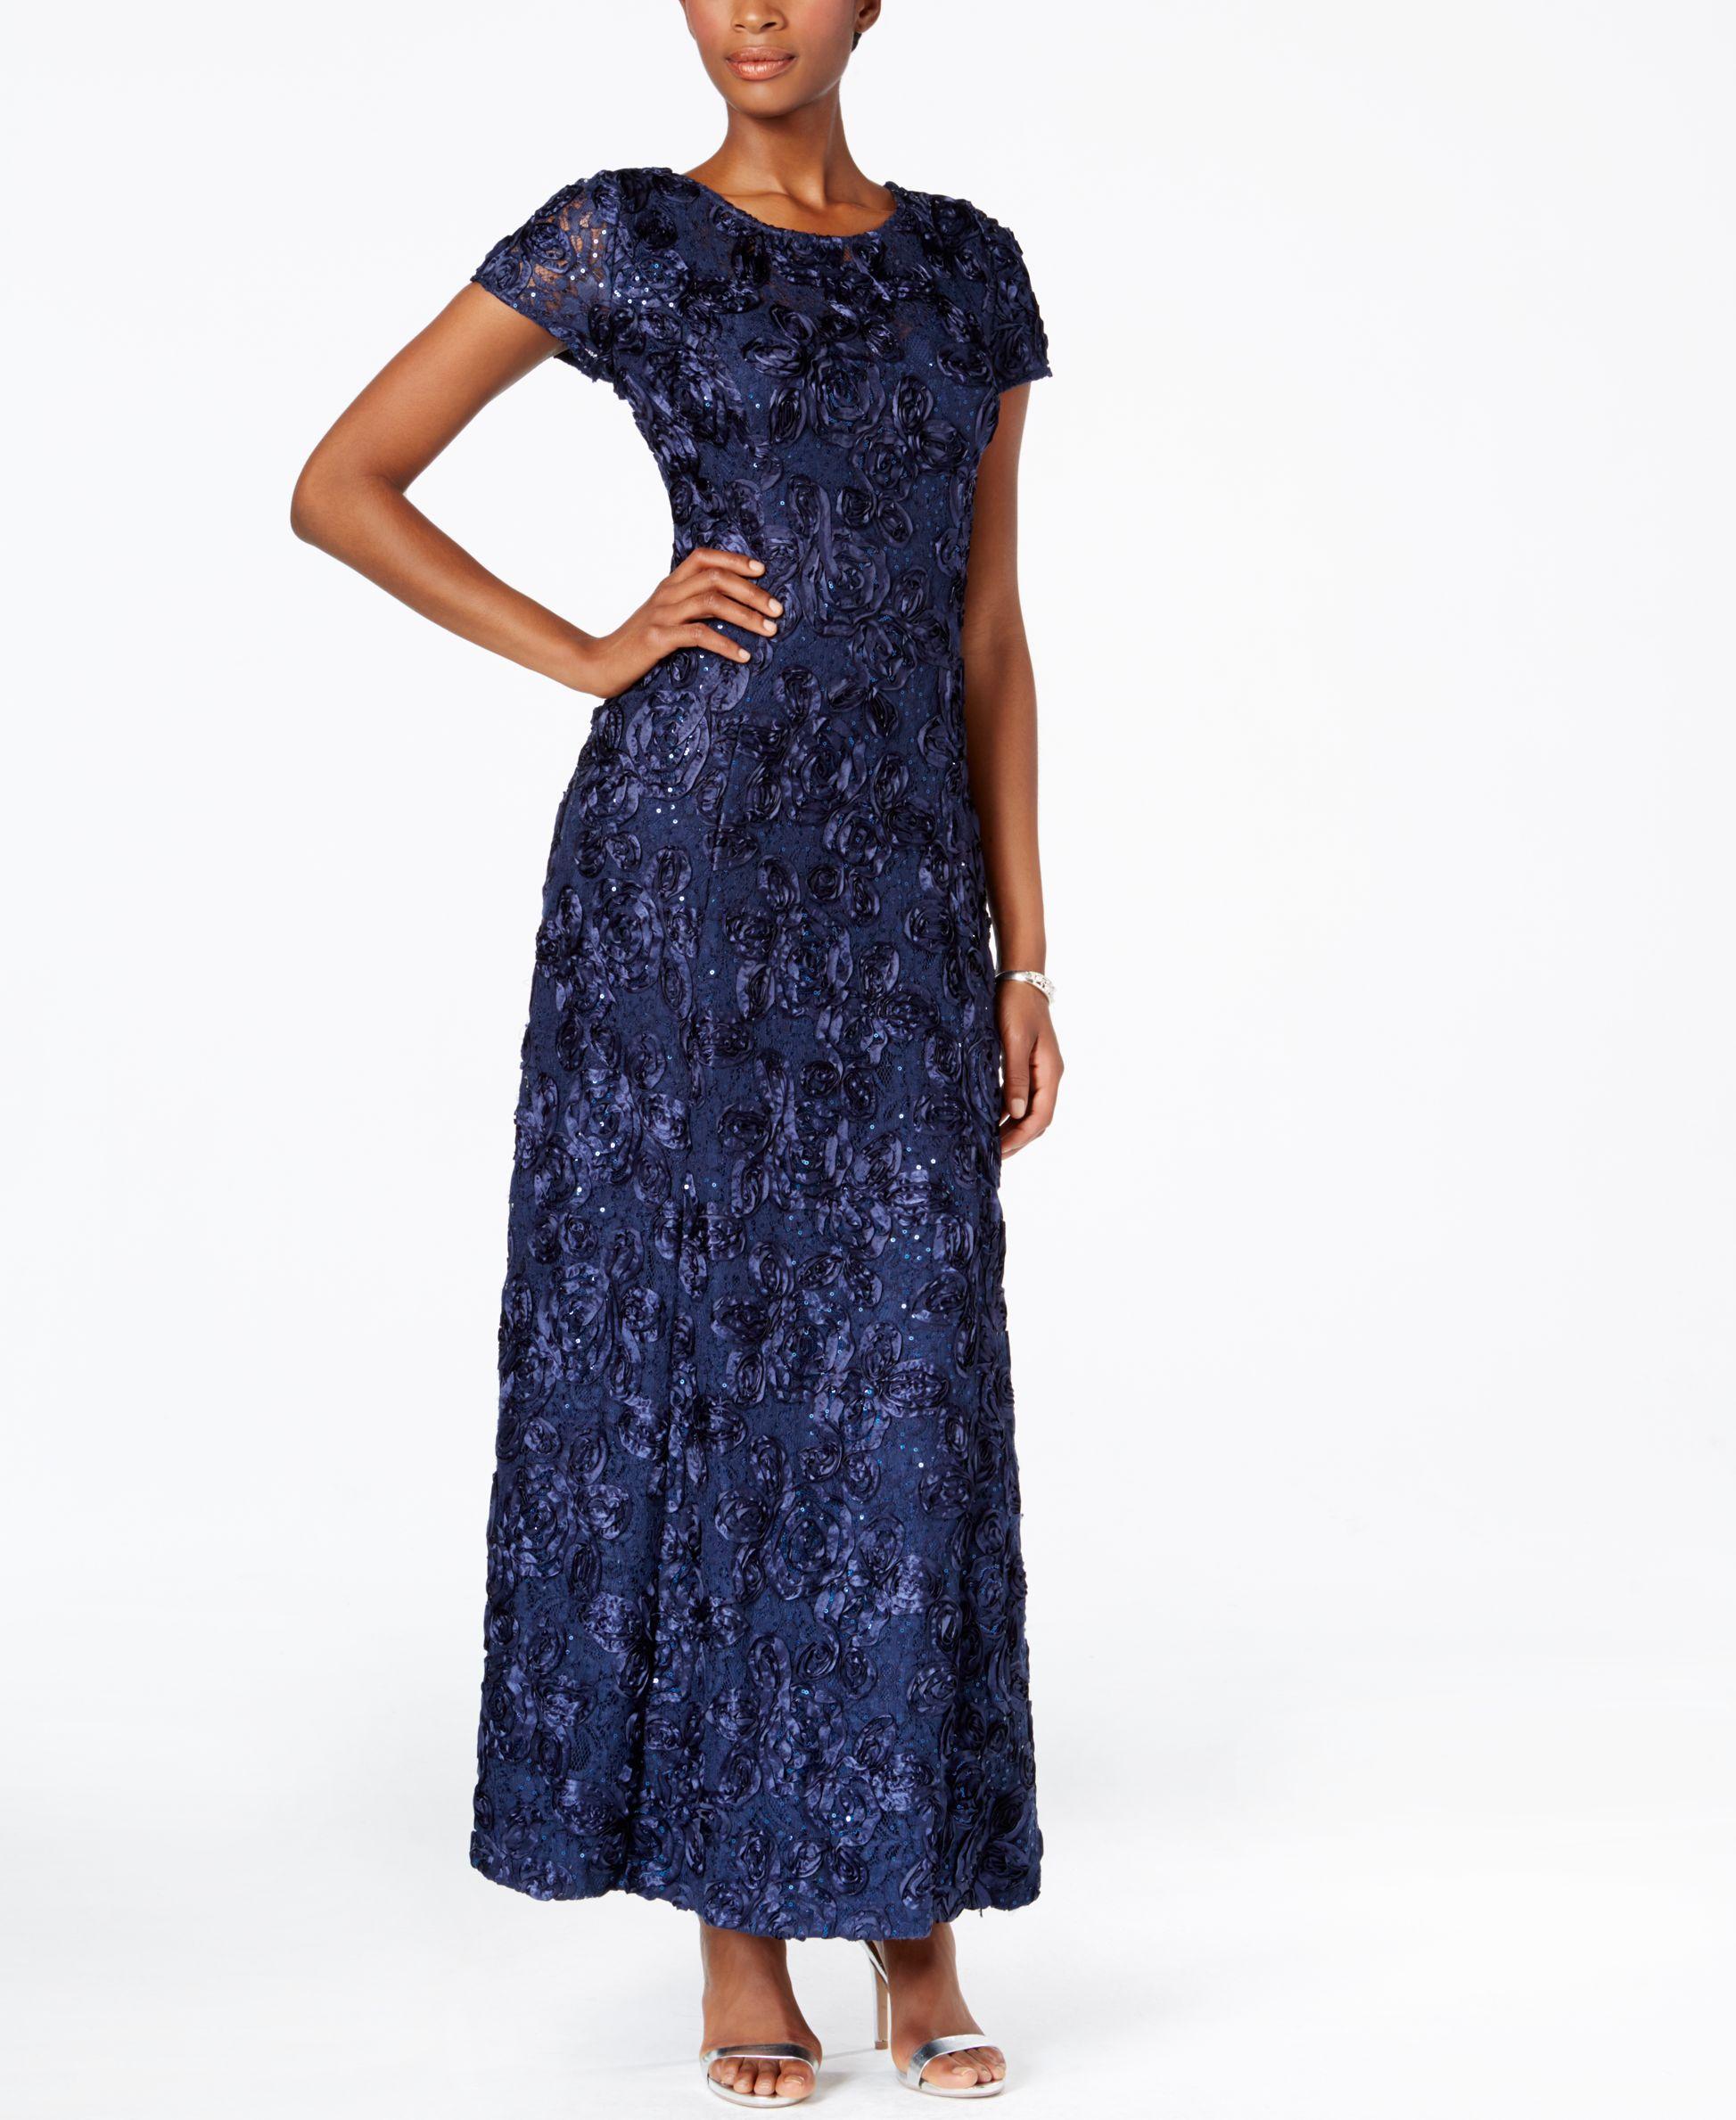 Macys Navy Blue Dresses: Alex Evenings Rosette A-line Gown In Blue